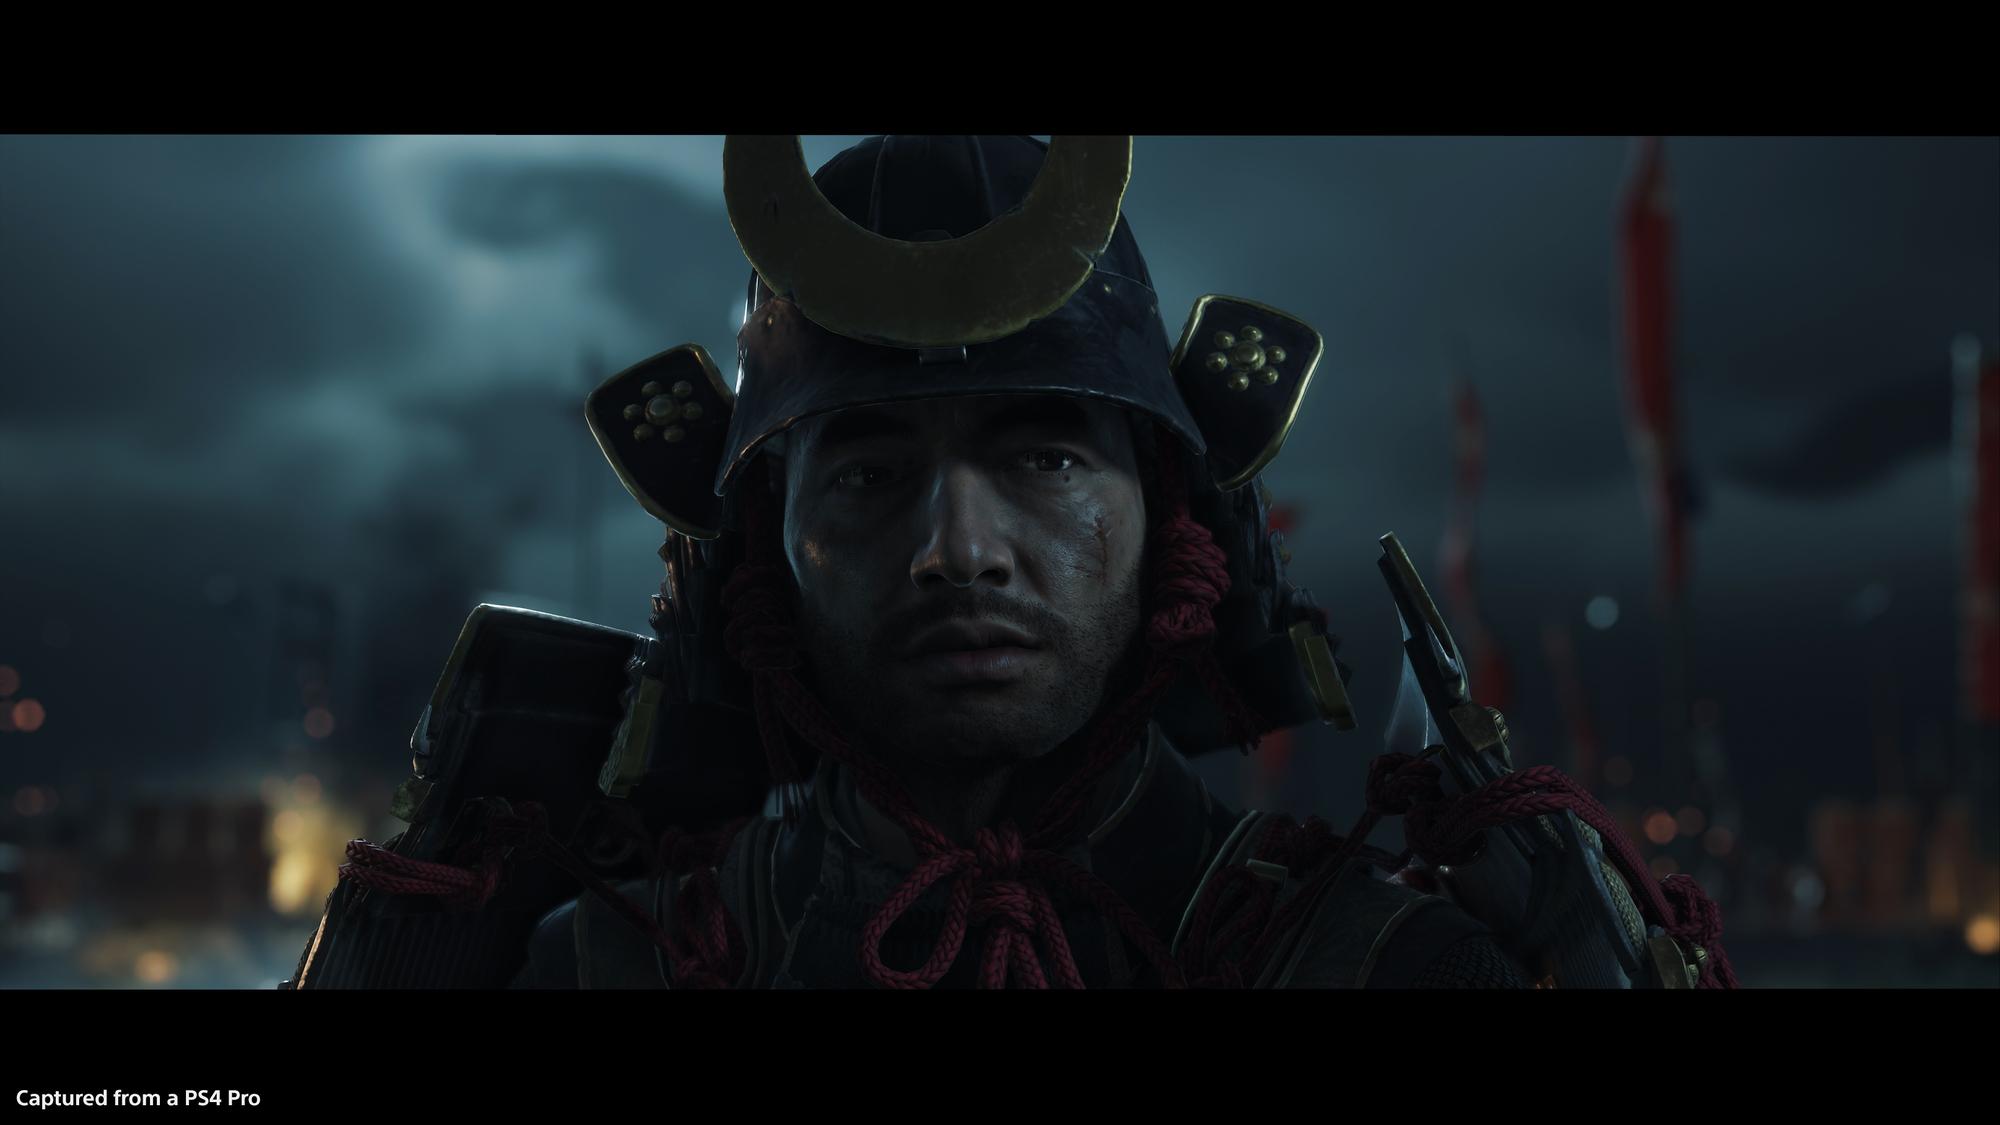 Players will take on the role of samurai Jin Sakai in Ghost of Tsushima.